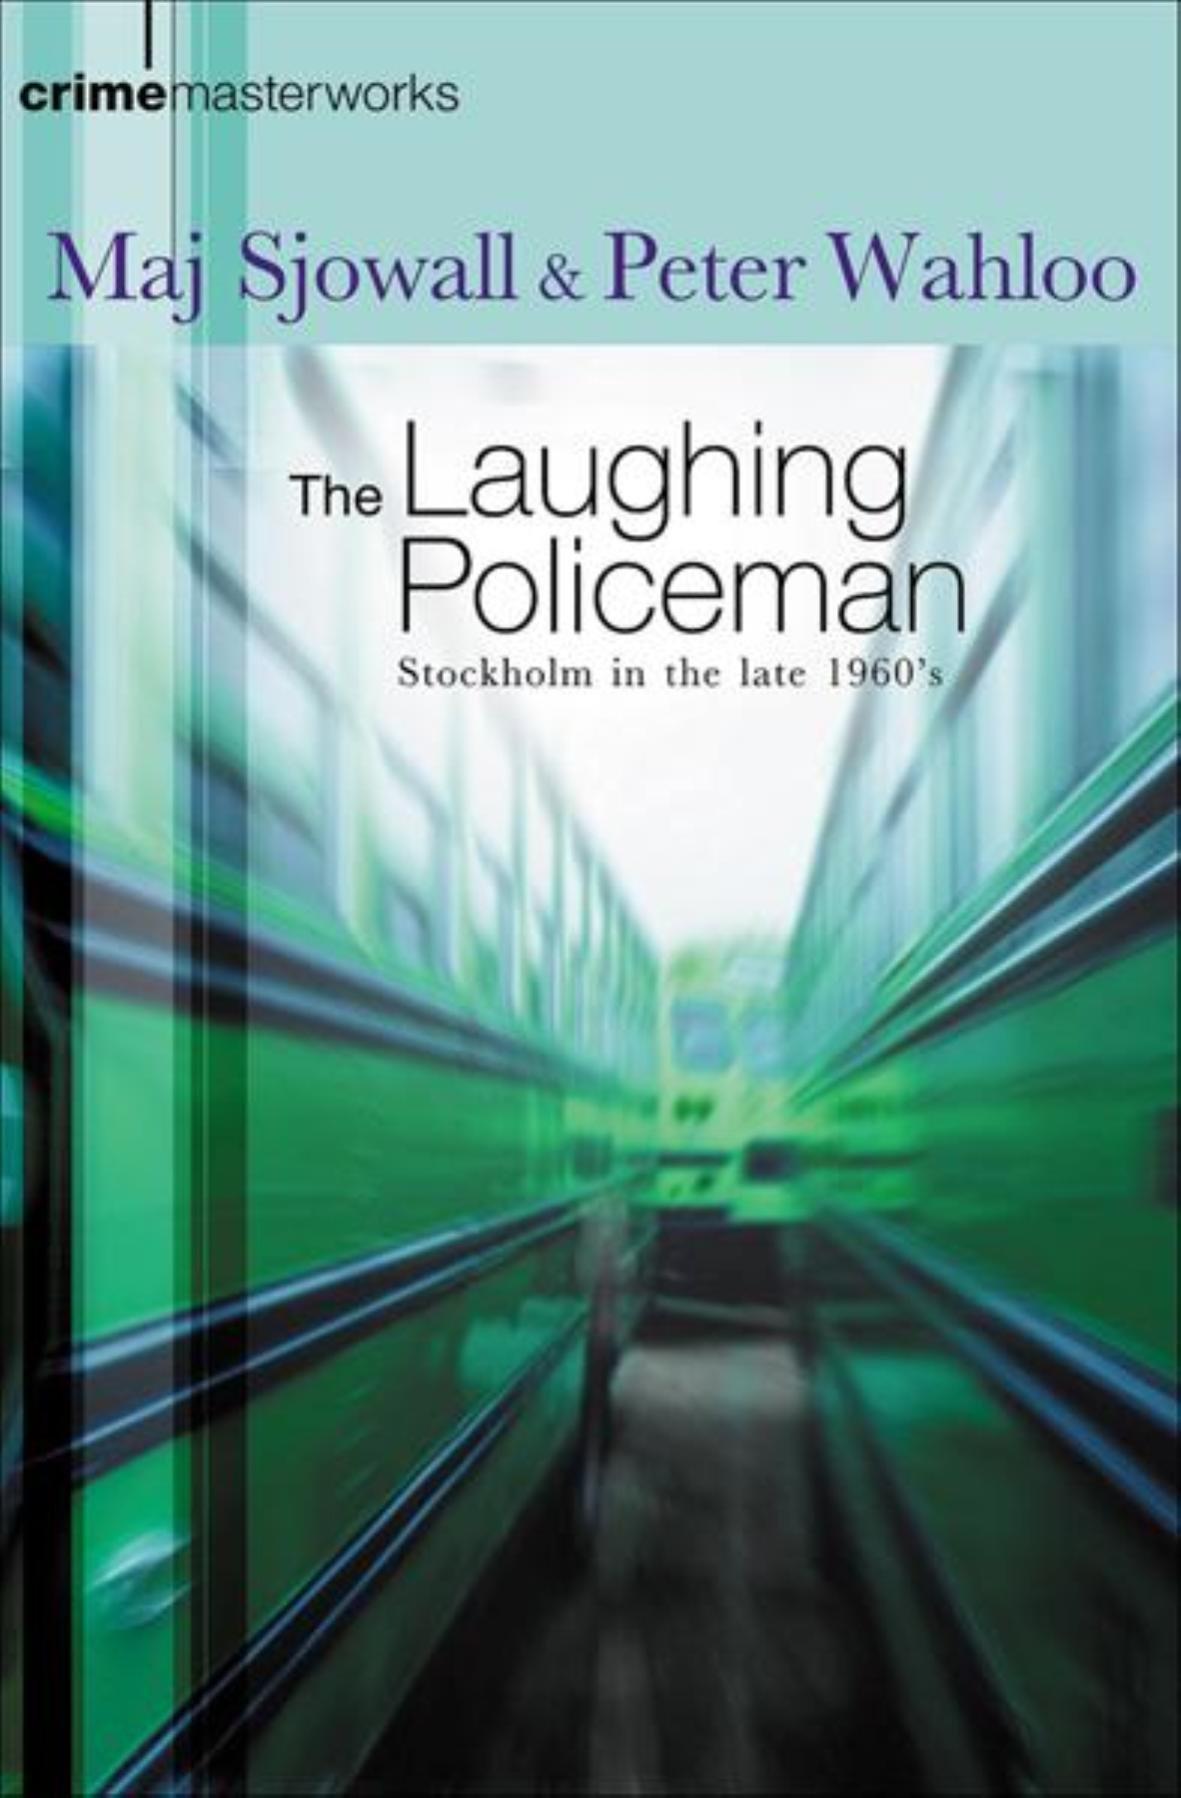 The Laughing Policeman (Crime Masterworks) PDF